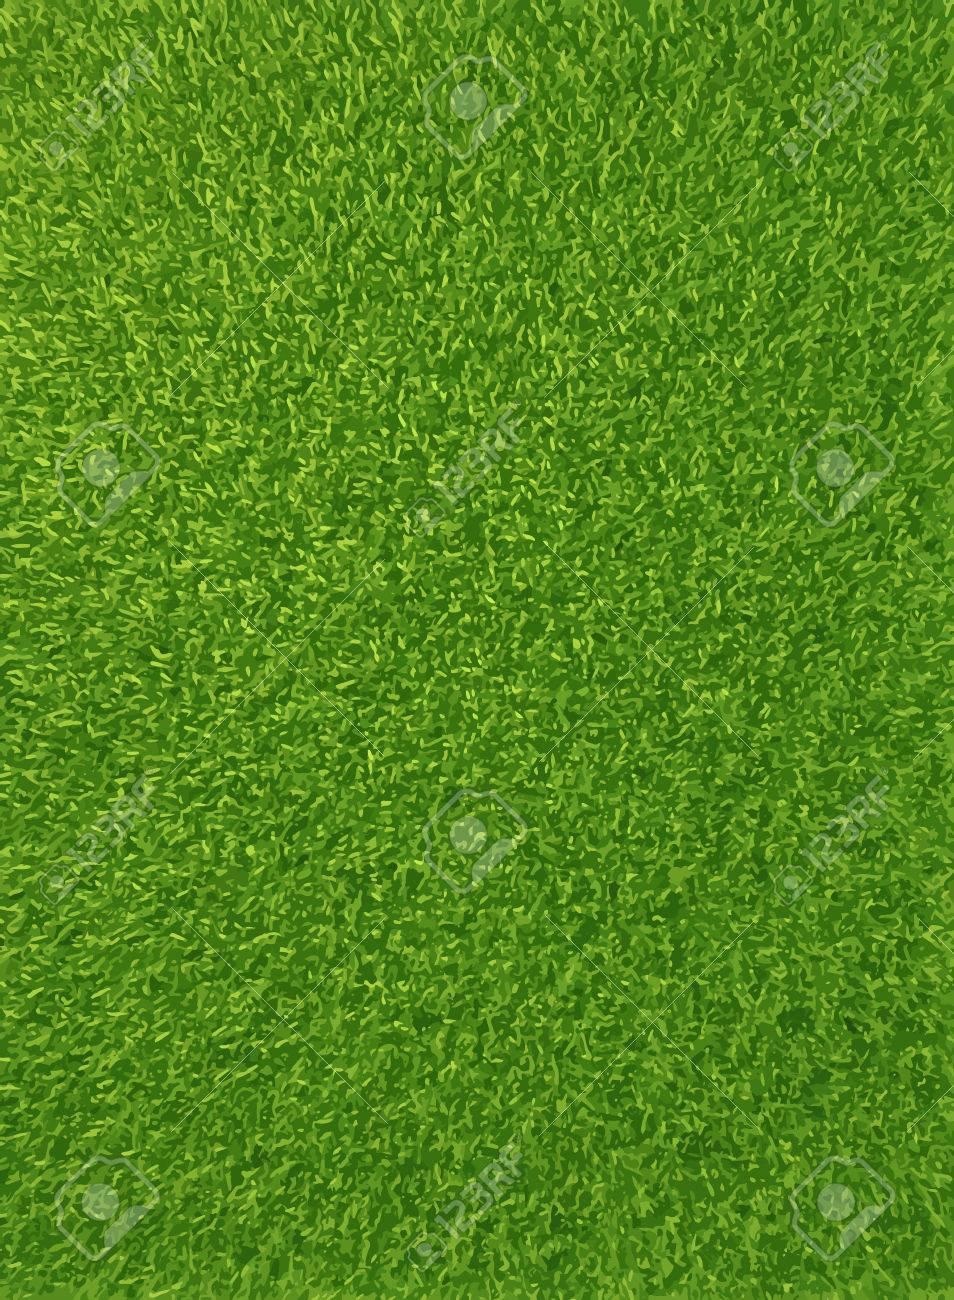 Vector background texture of fresh green grass. - 46273314